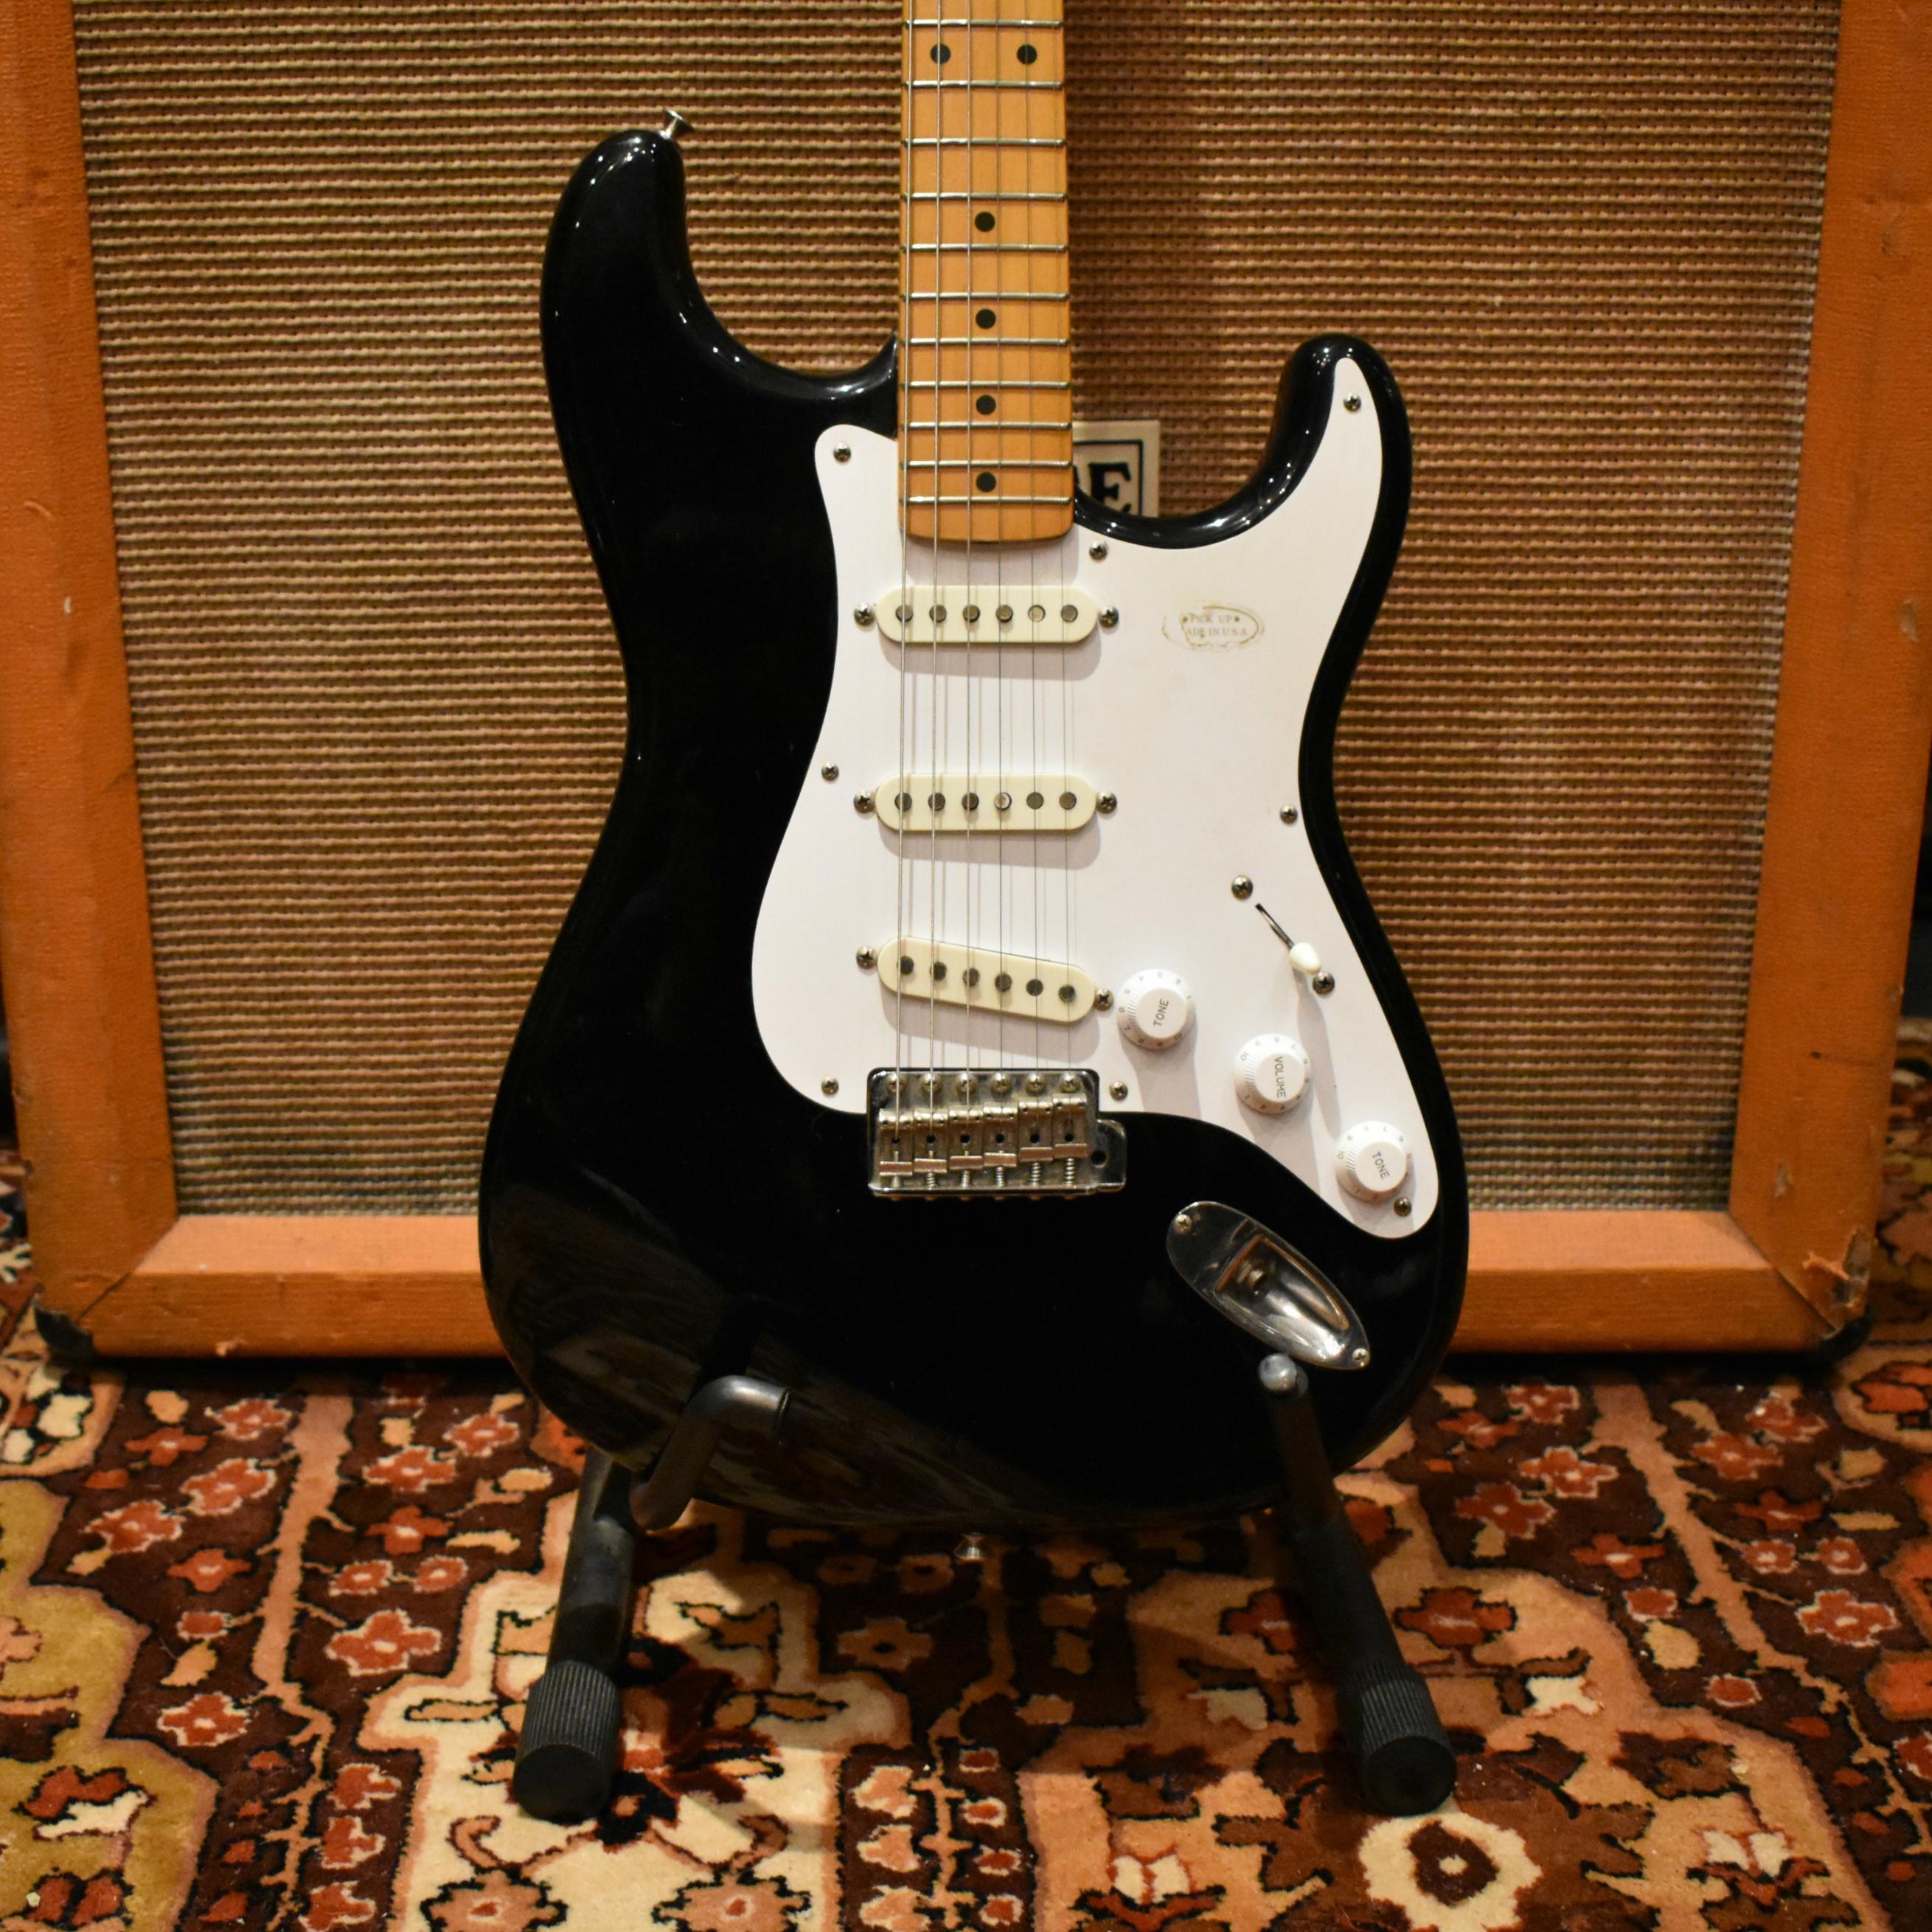 Vintage 1983 Fender JV Squier Stratocaster 57 Reissue Black Stratocaster